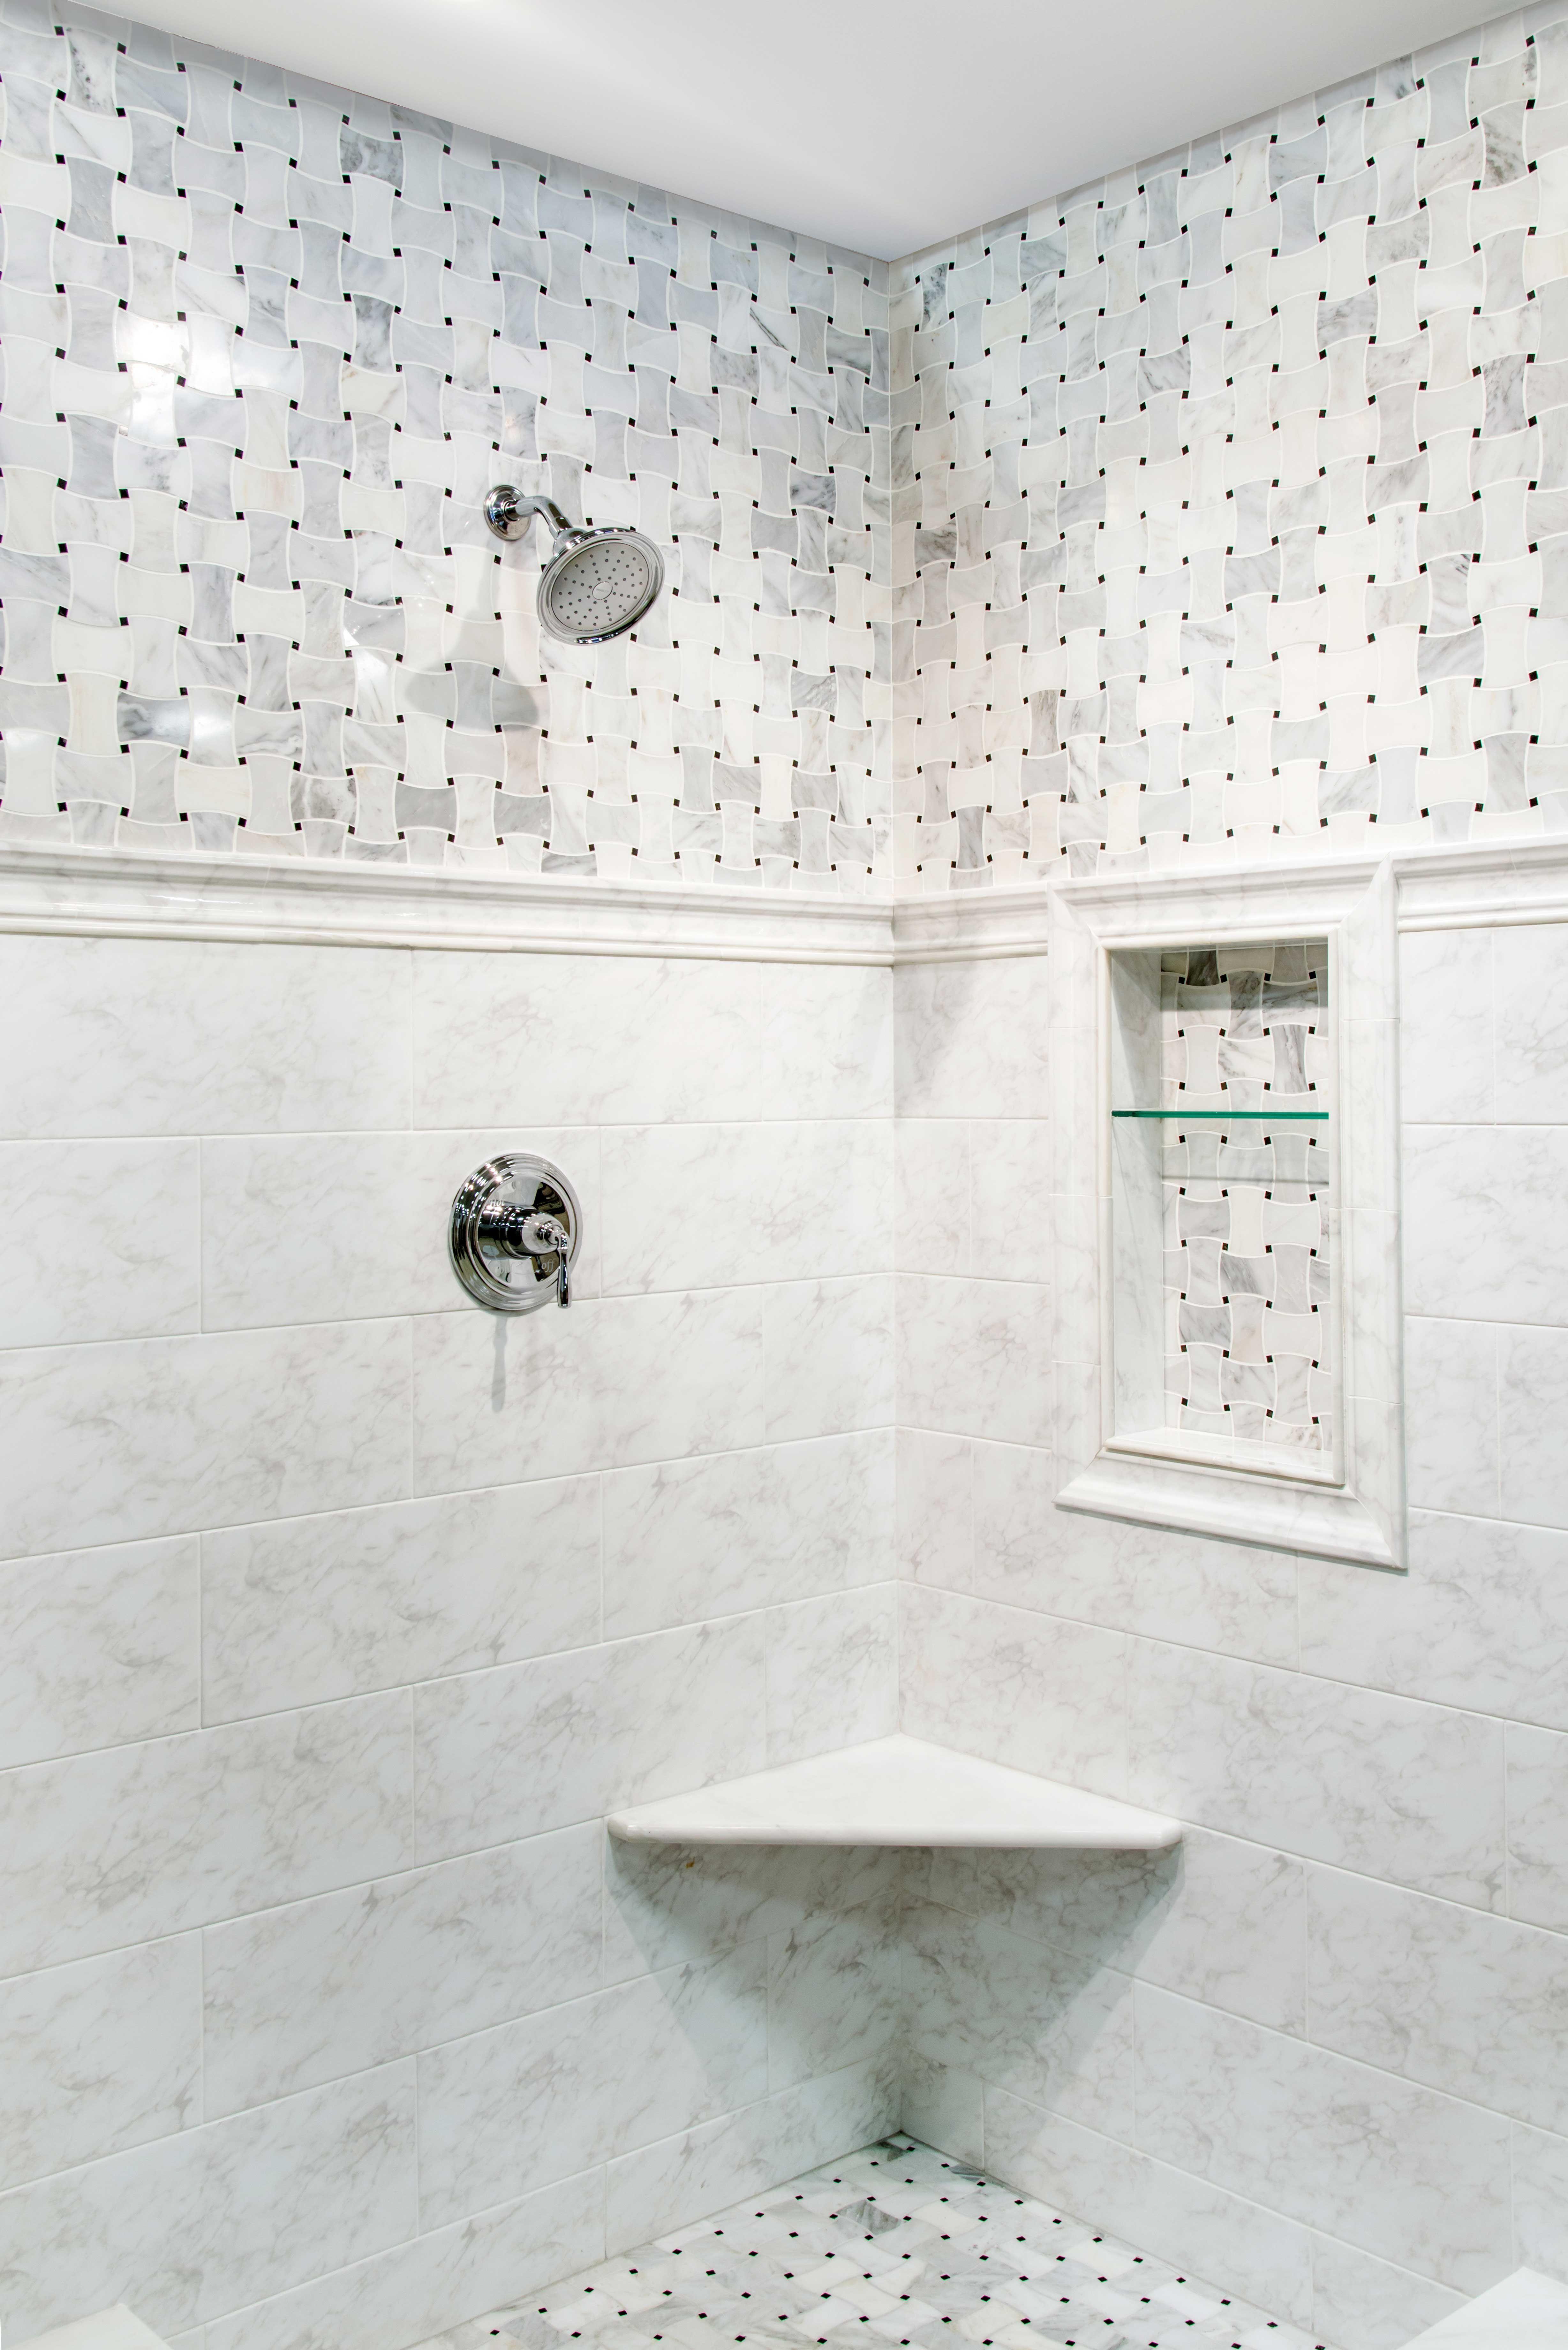 34 Luxury Ceramic Tiles Bathroom Patterned Bathroom Tiles